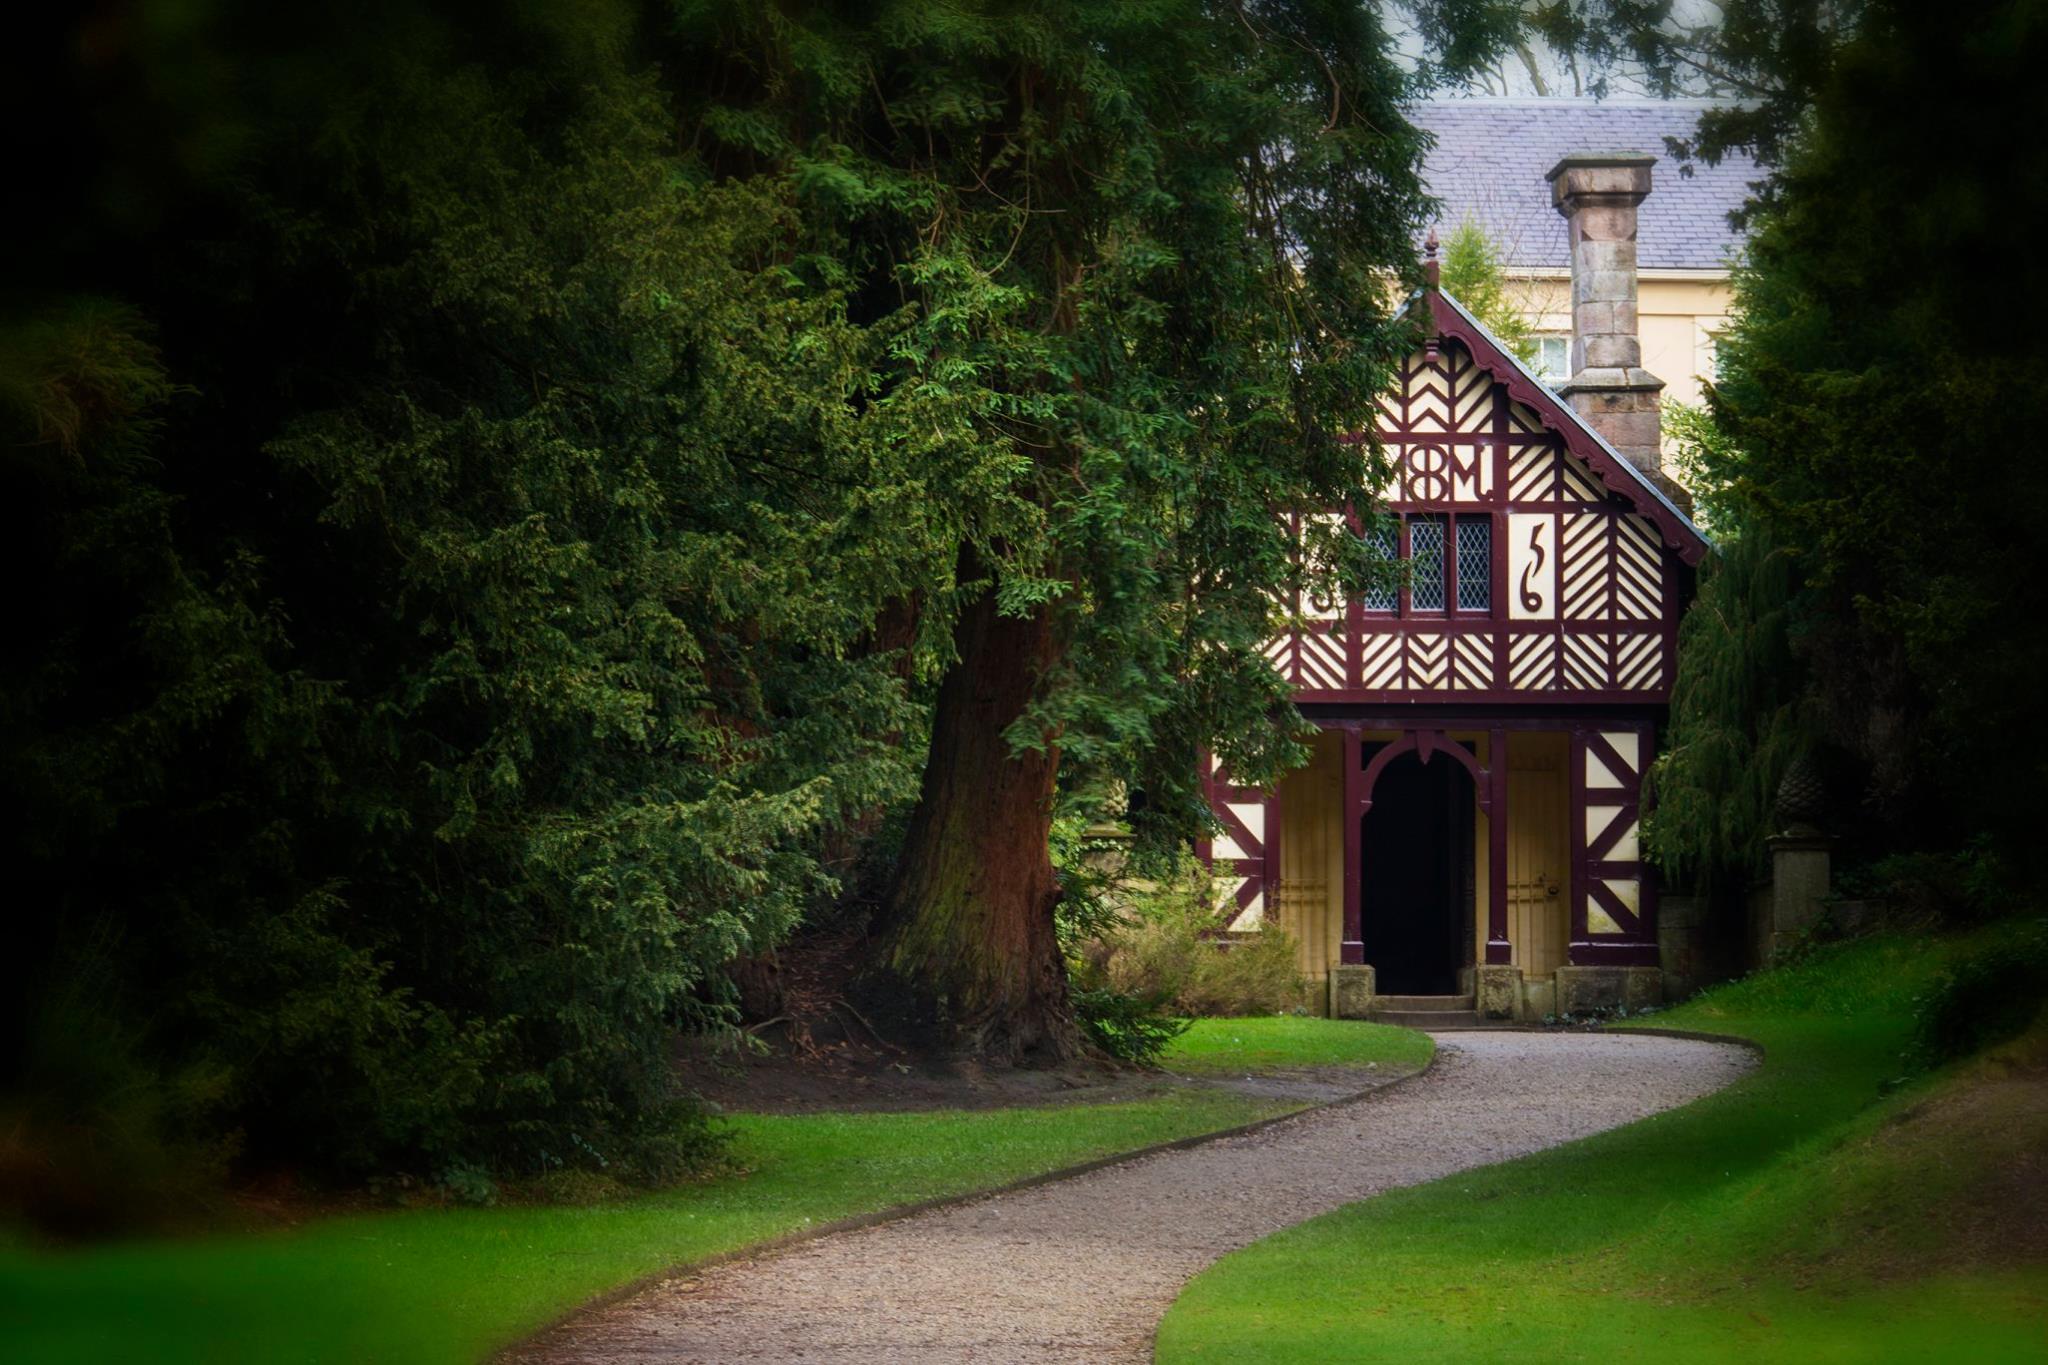 Biddulph grange, United Kingdom